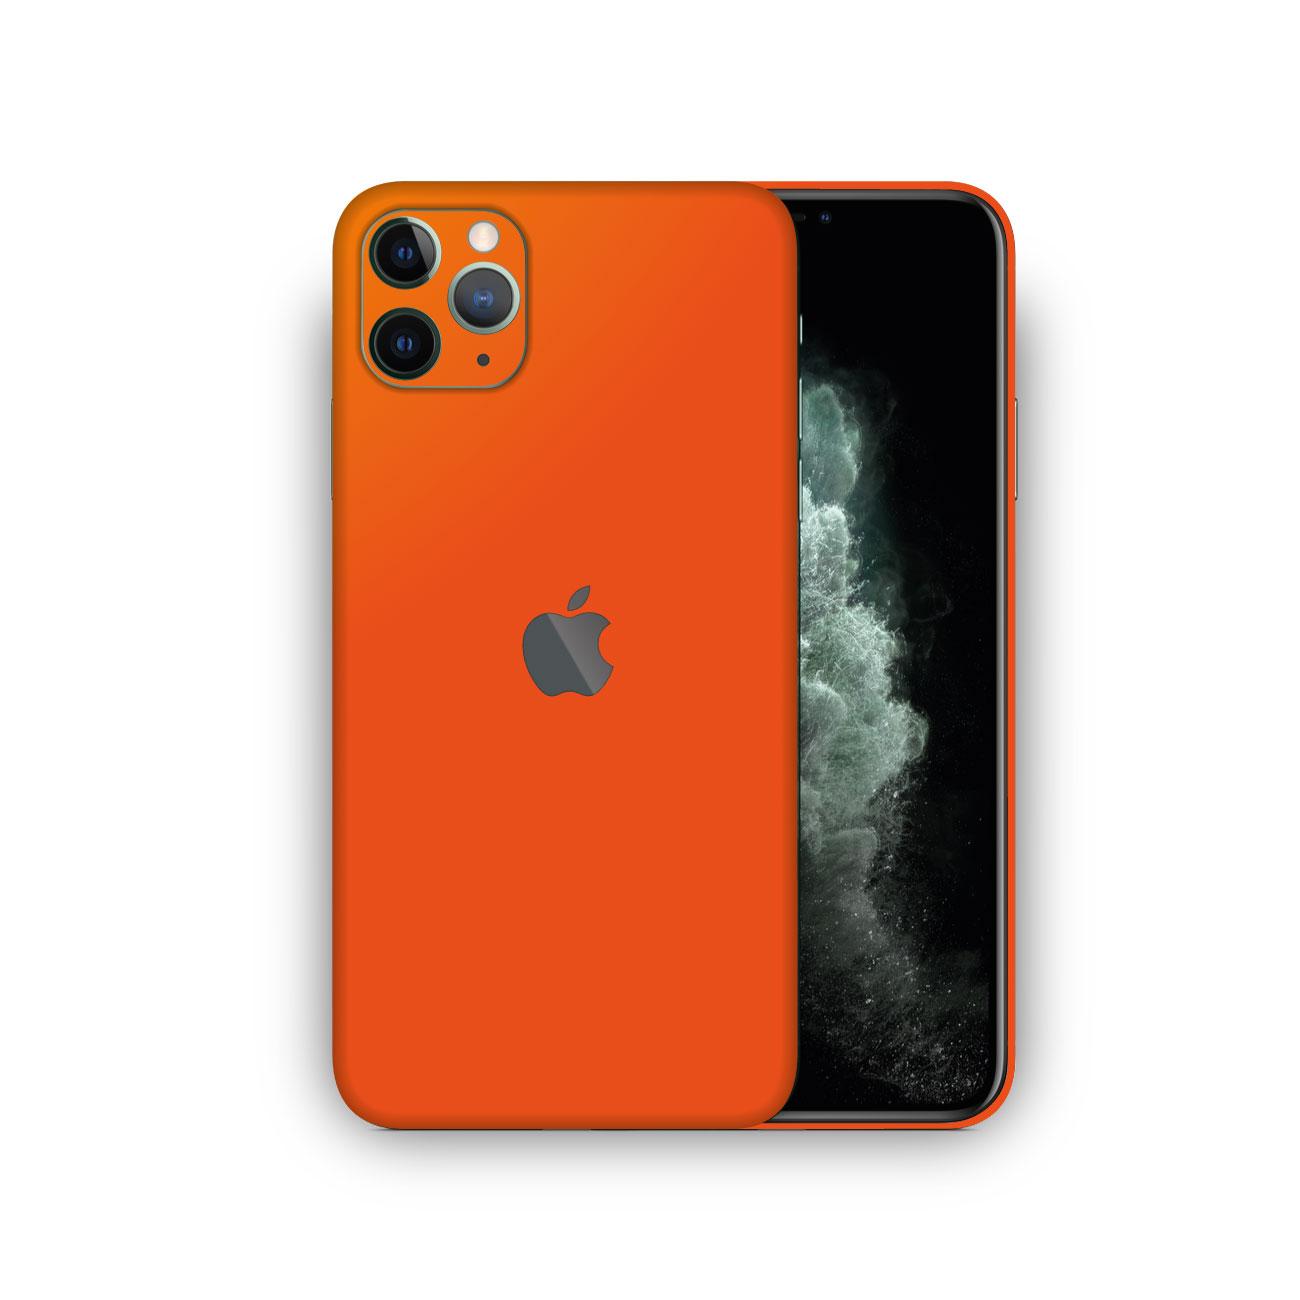 Apple iPhone 11 Pro Max MATTE ORANGE Skin Vinyl Wrap